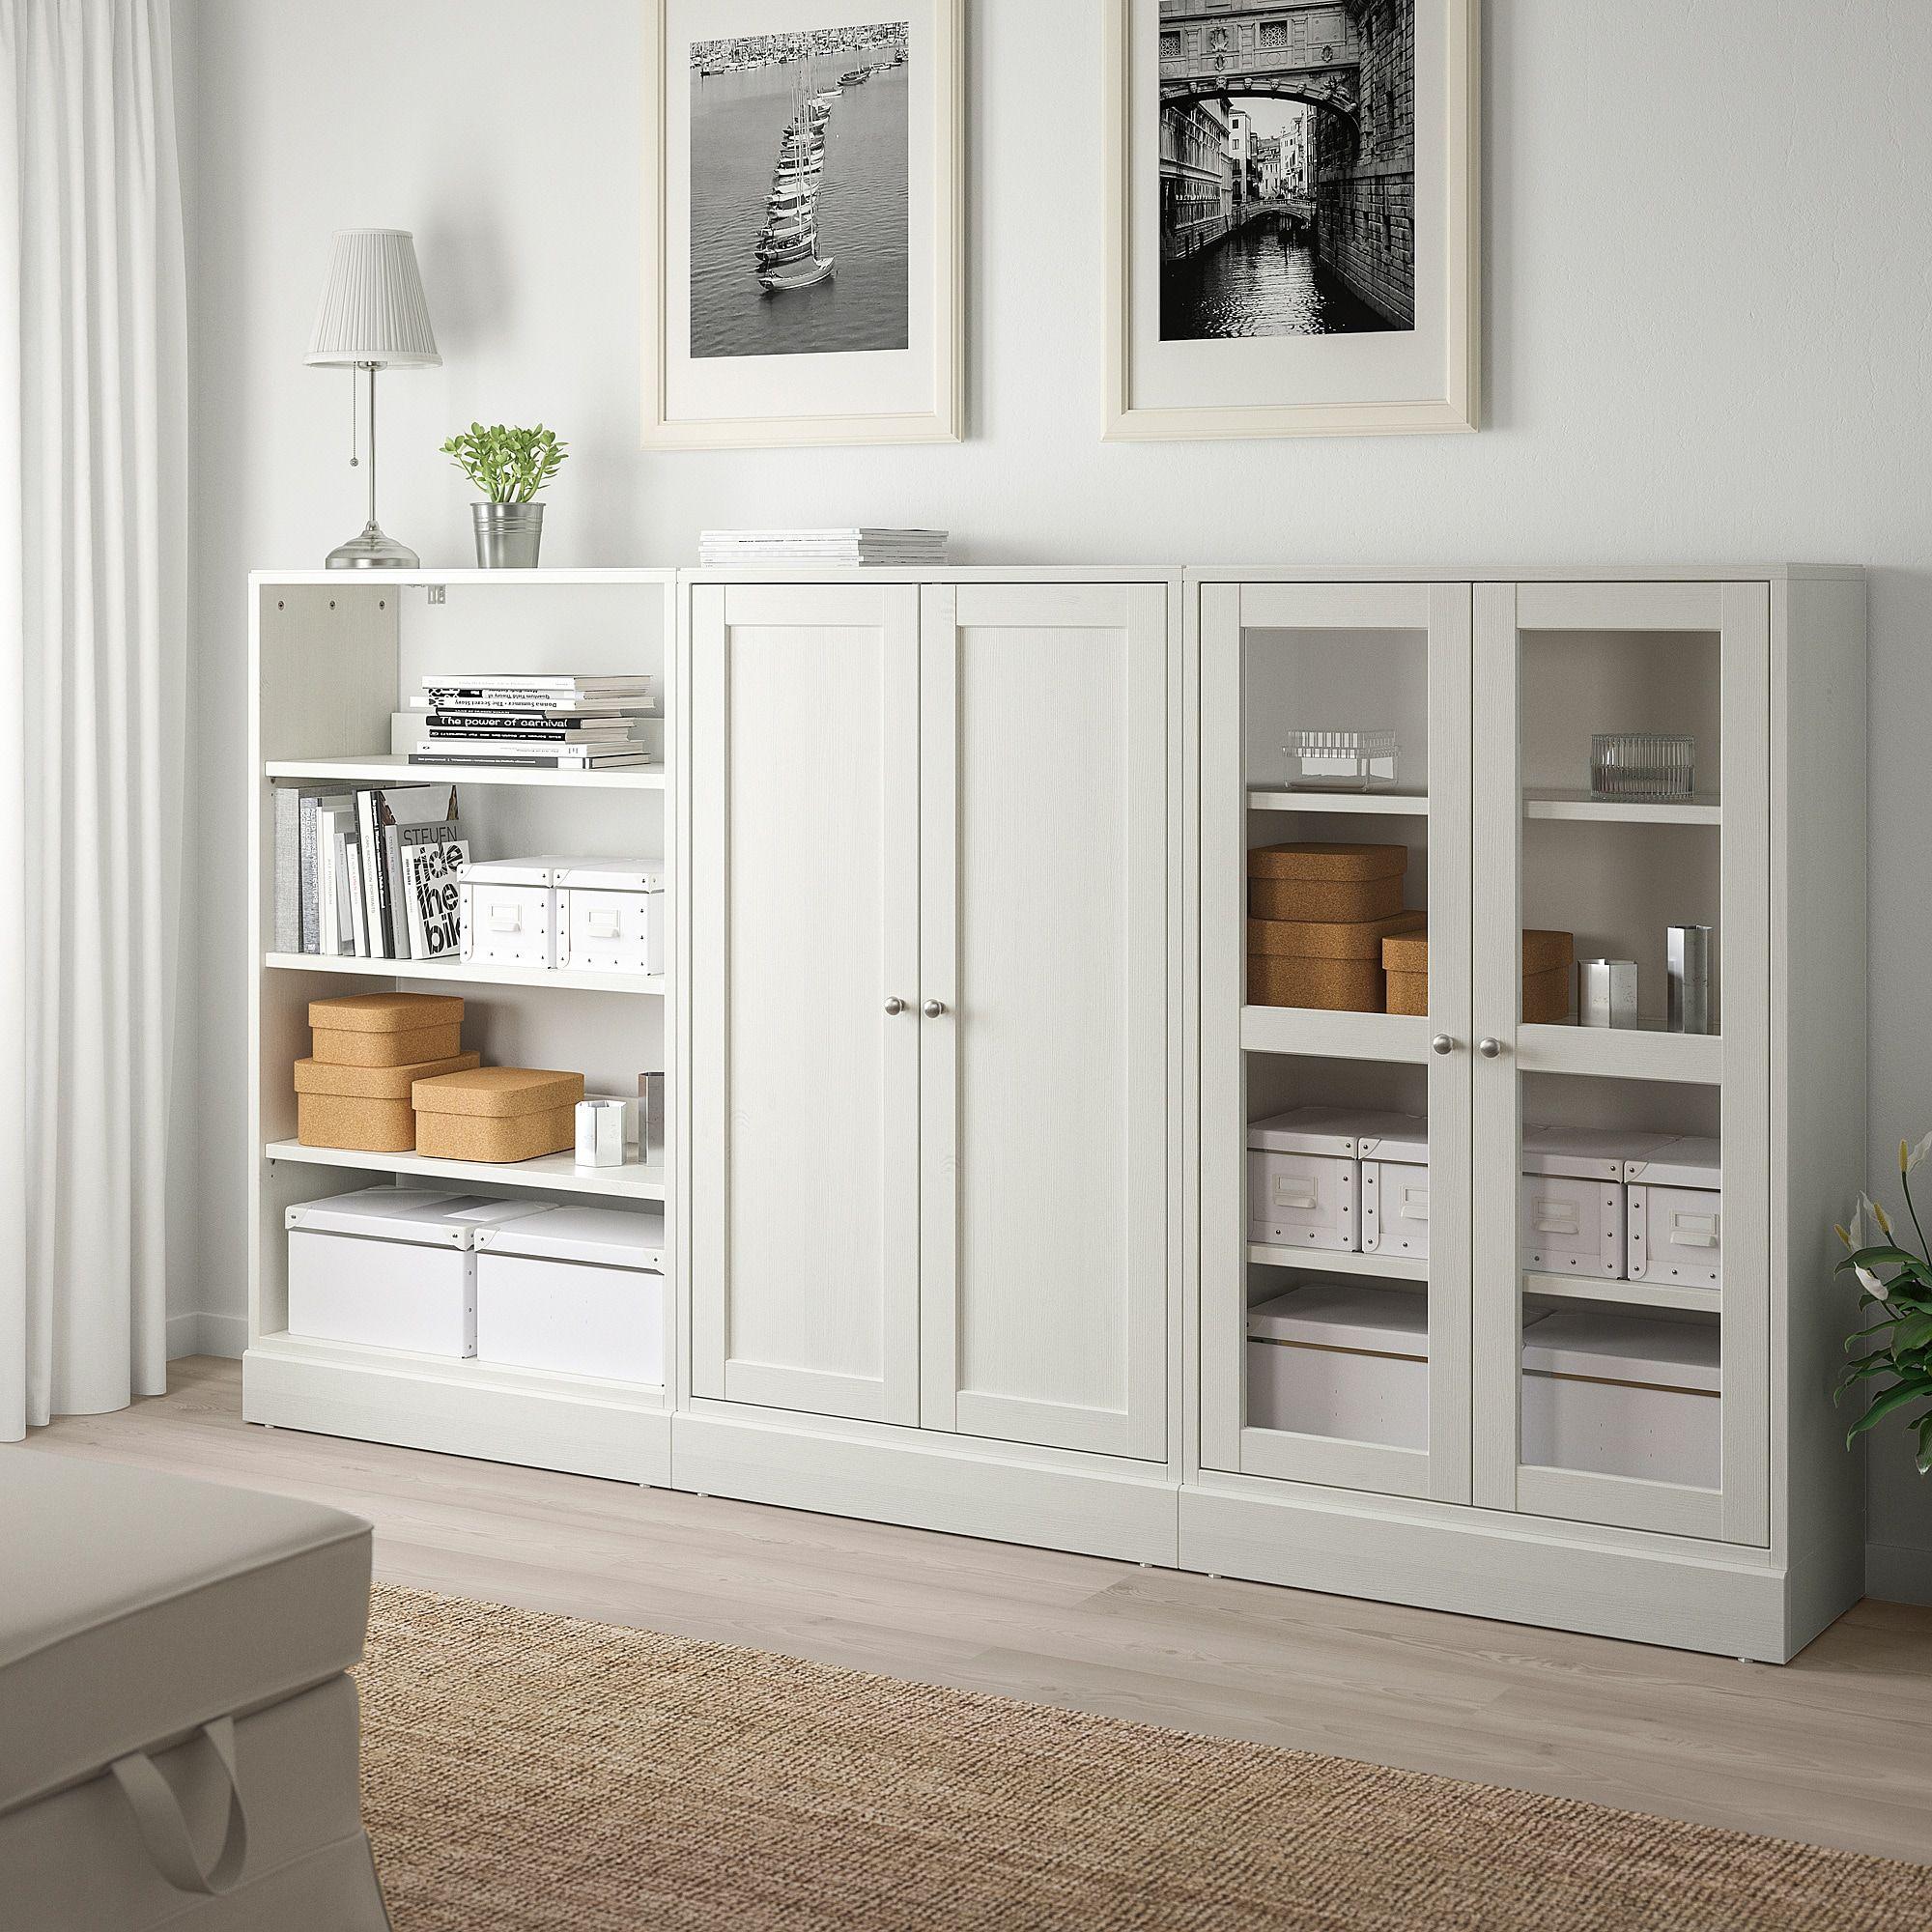 HAVSTA Storage Combination W/glass Doors White